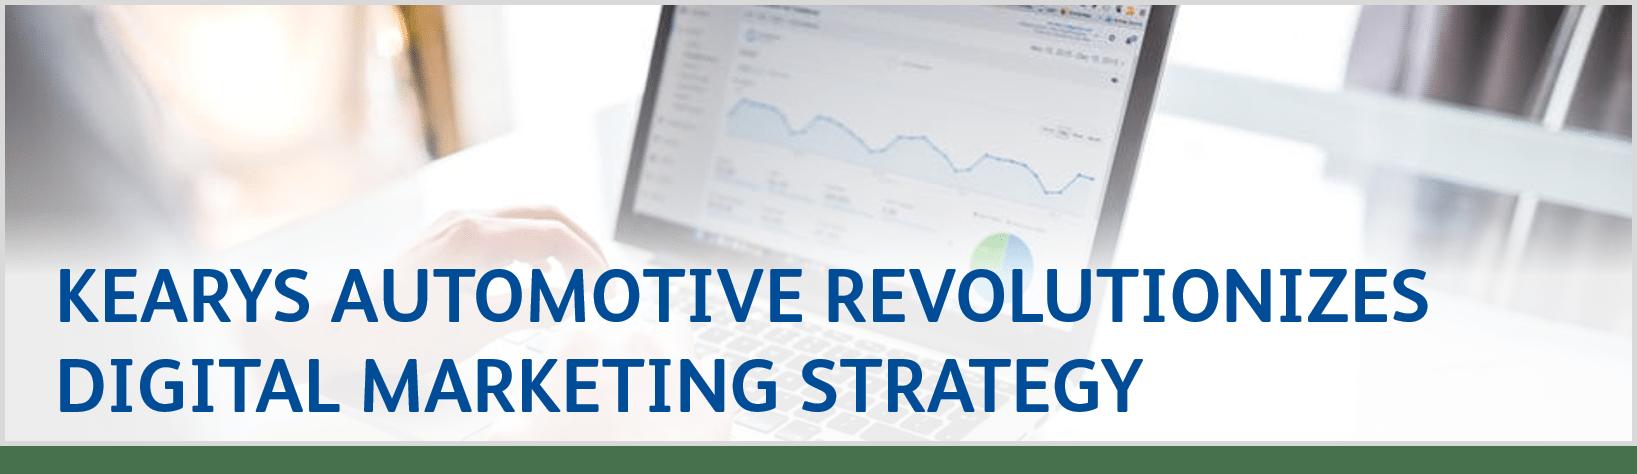 Kearys Automotive Revolutionizes Digital Marketing Strategy